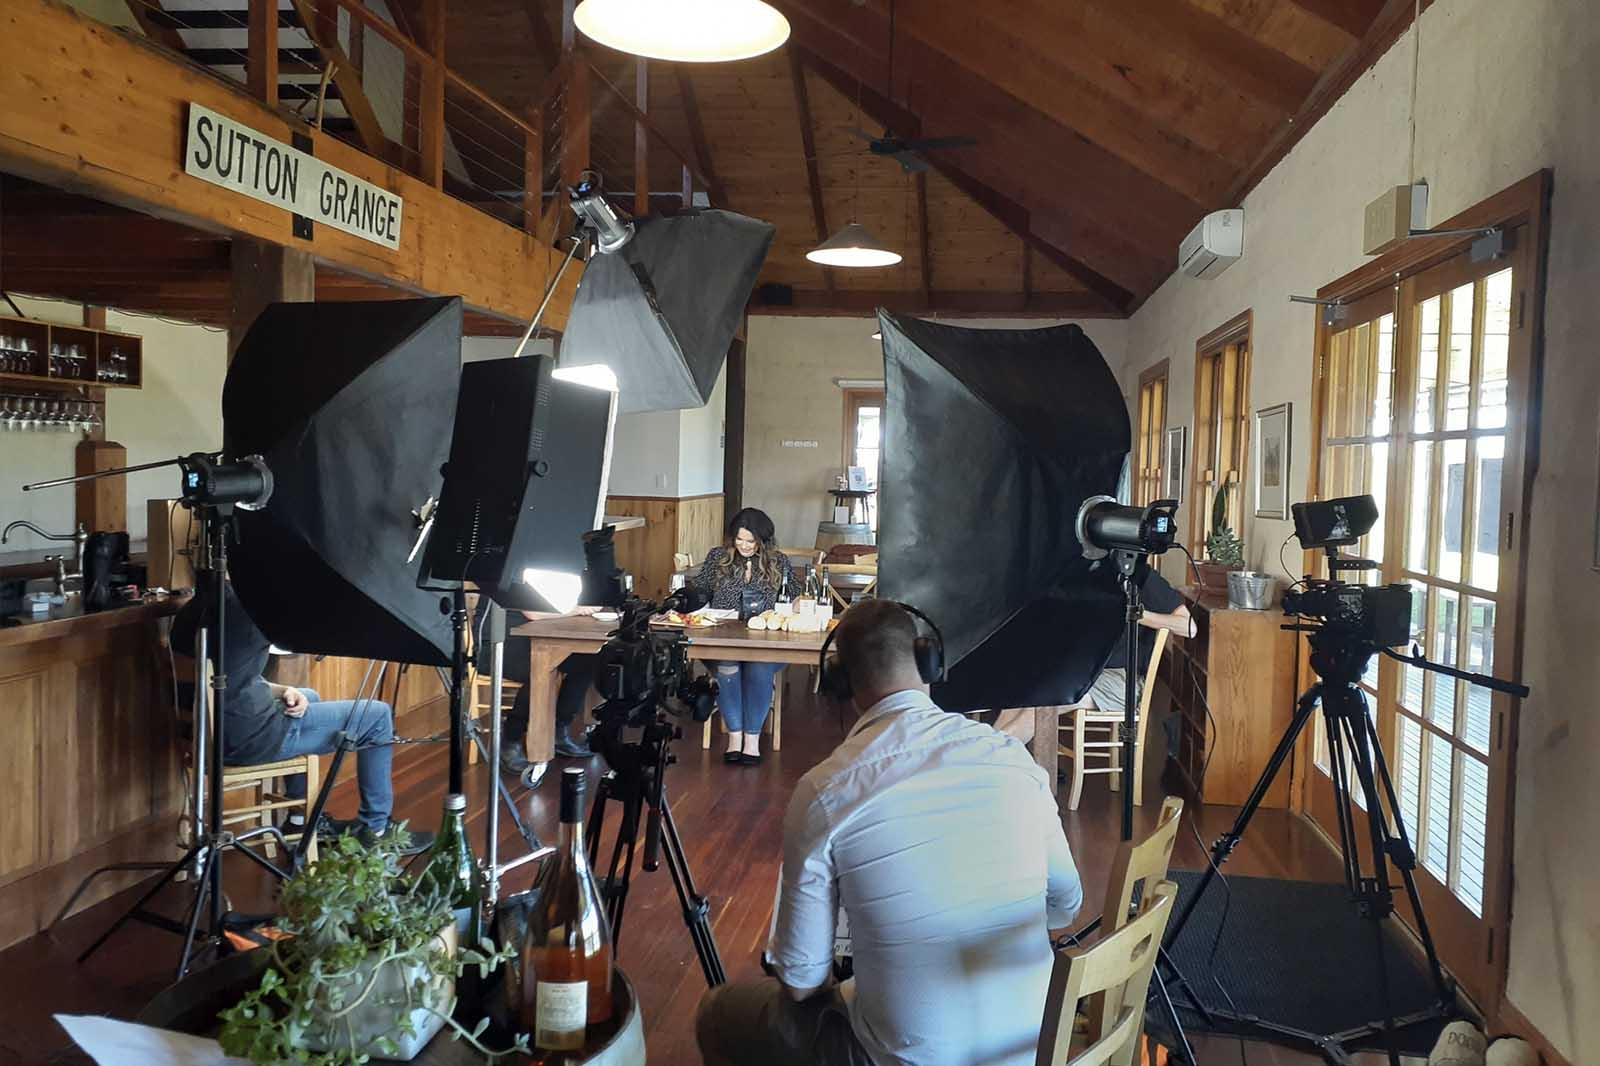 Vid.Co Team at video production set at Sutton Grange in Bendigo